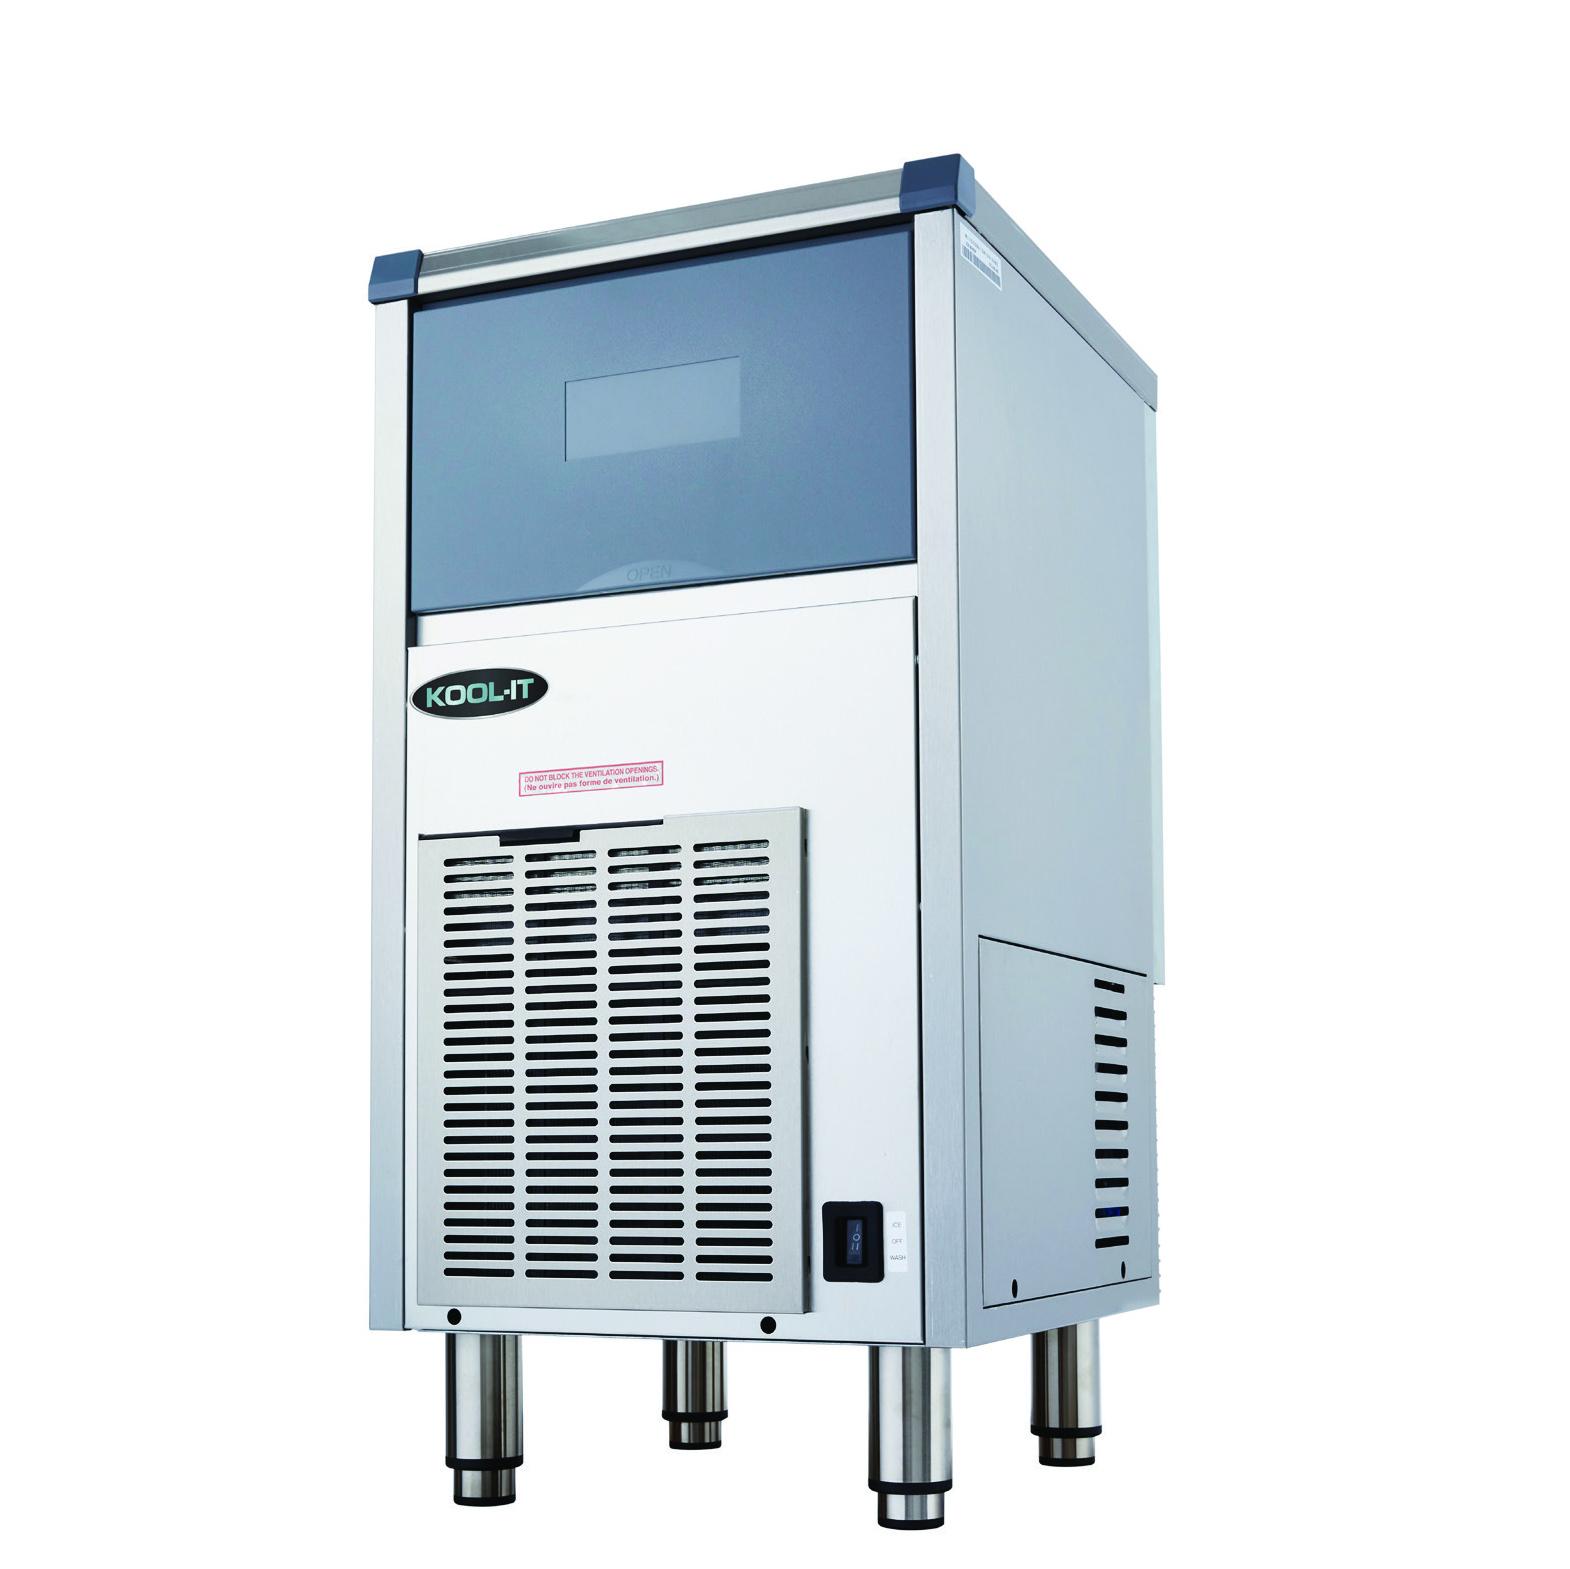 MVP Group LLC KCU-80-AB ice maker with bin, cube-style